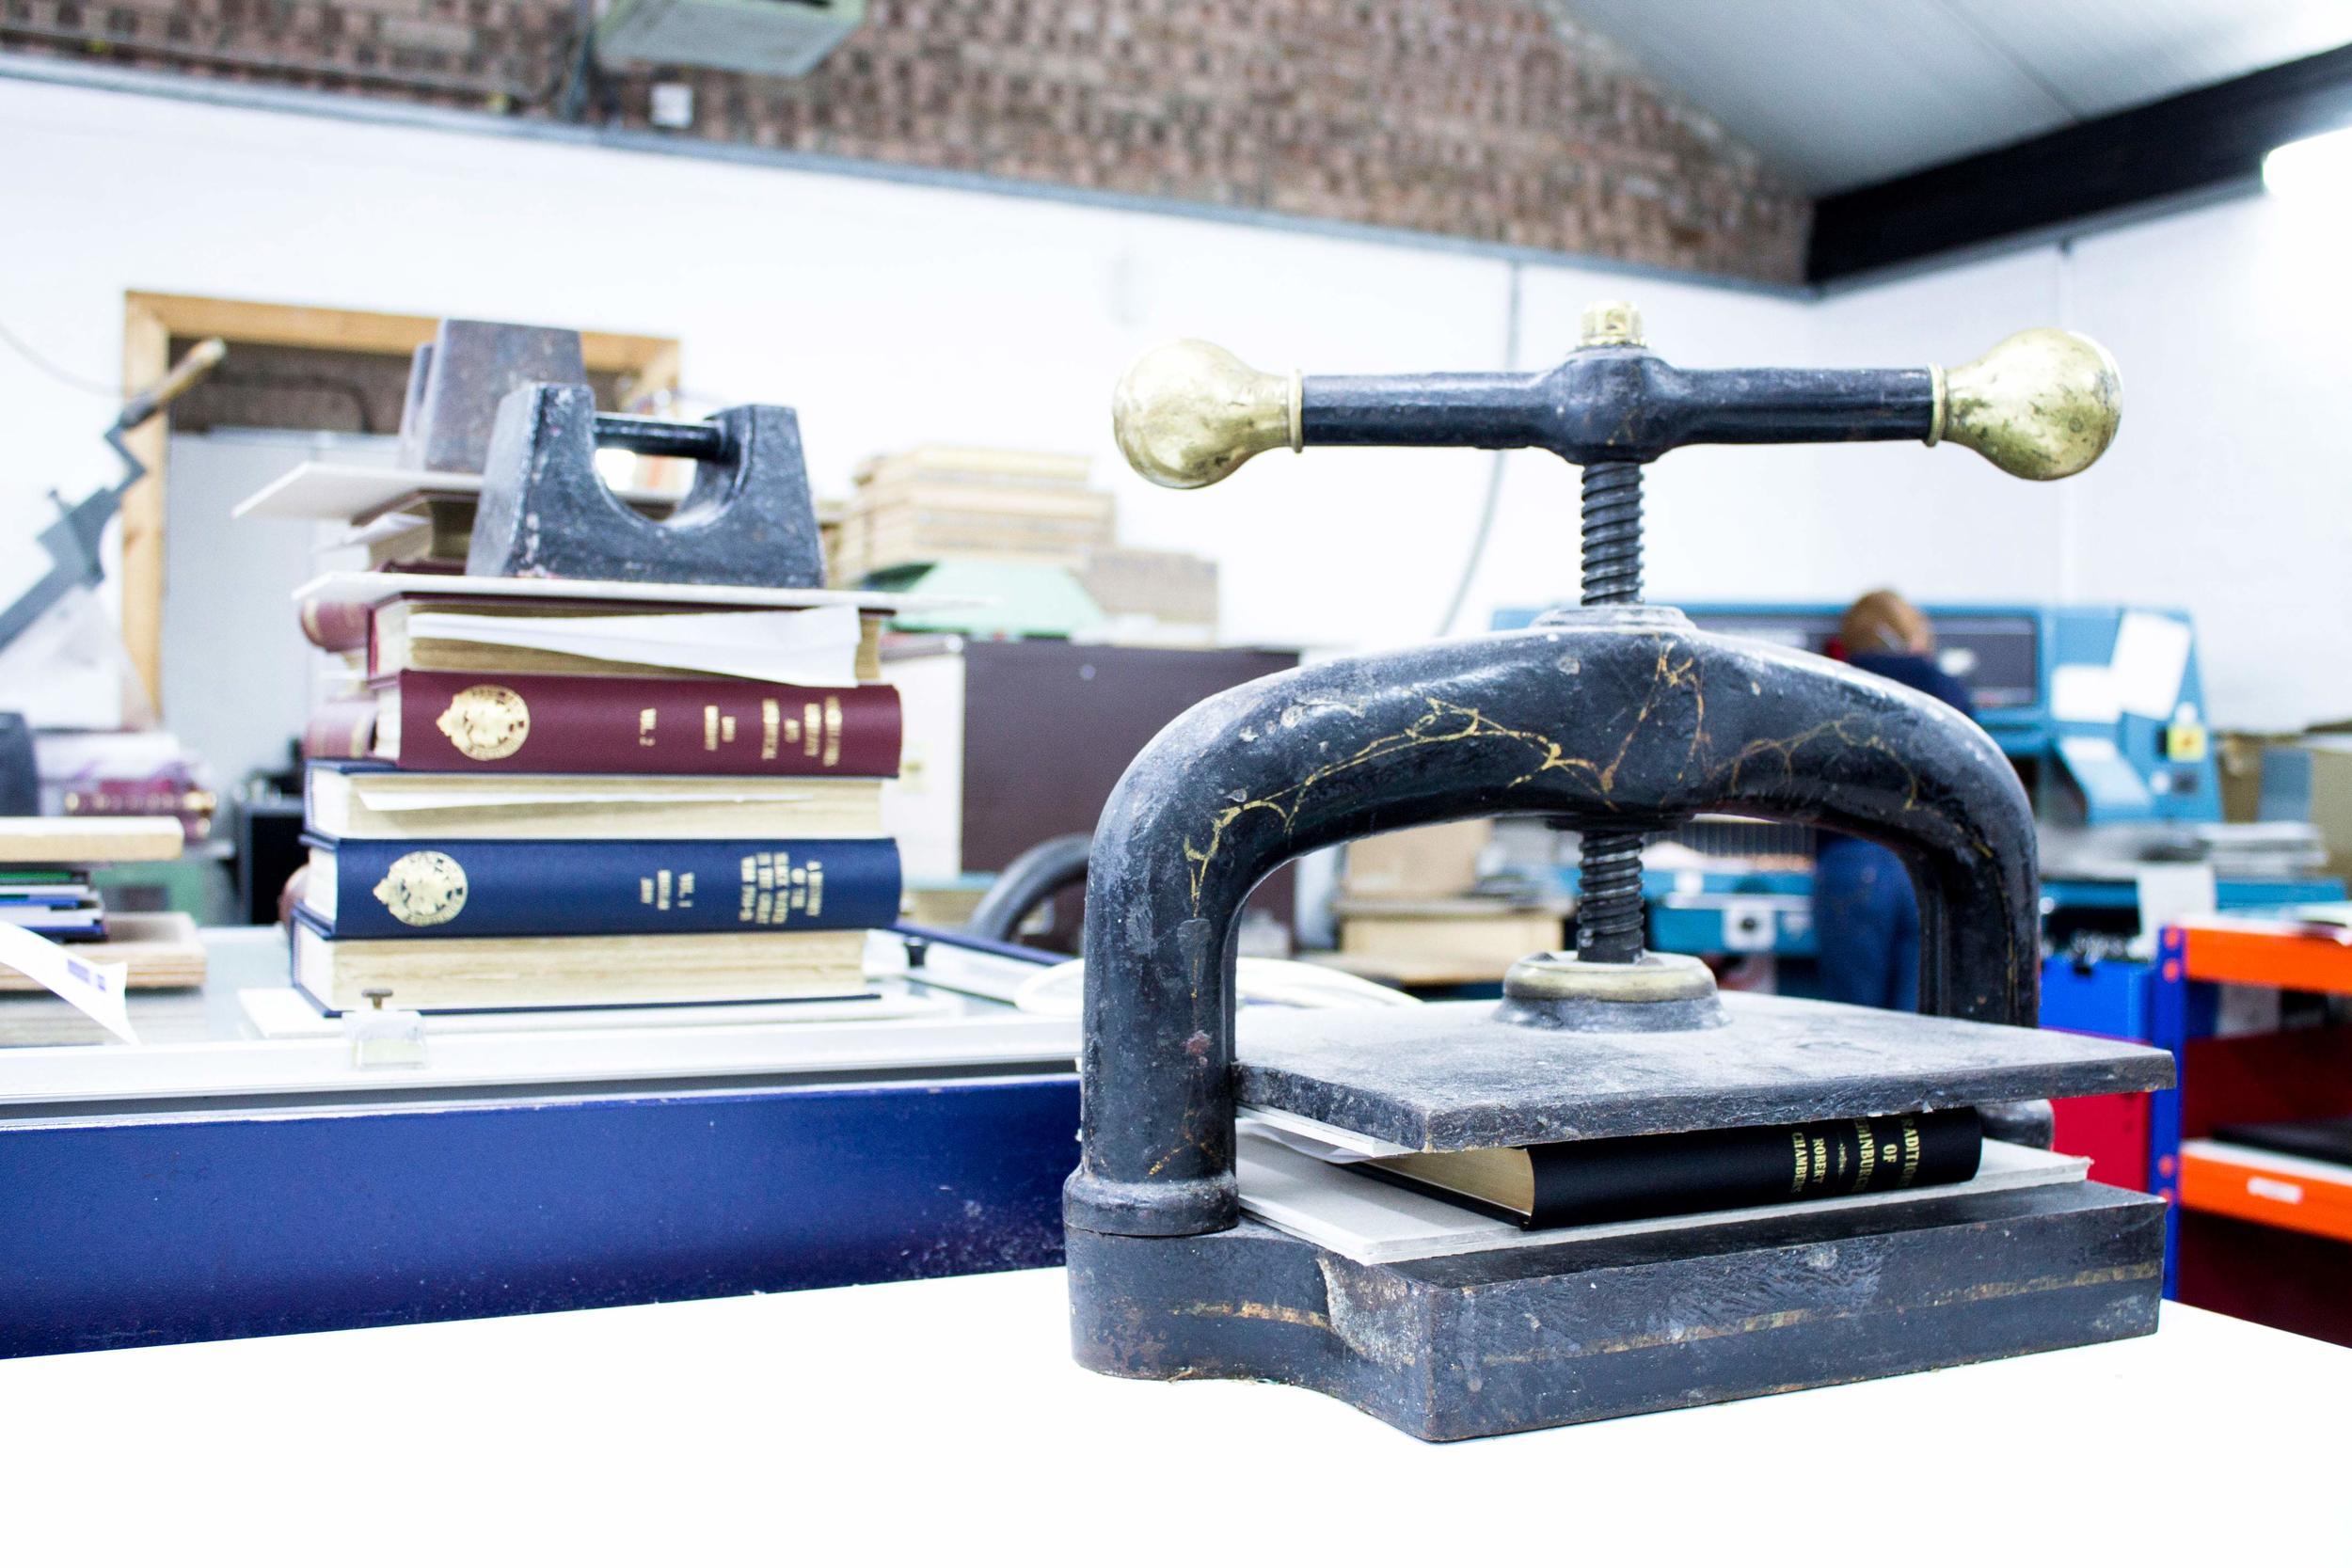 Bookbinding Studio